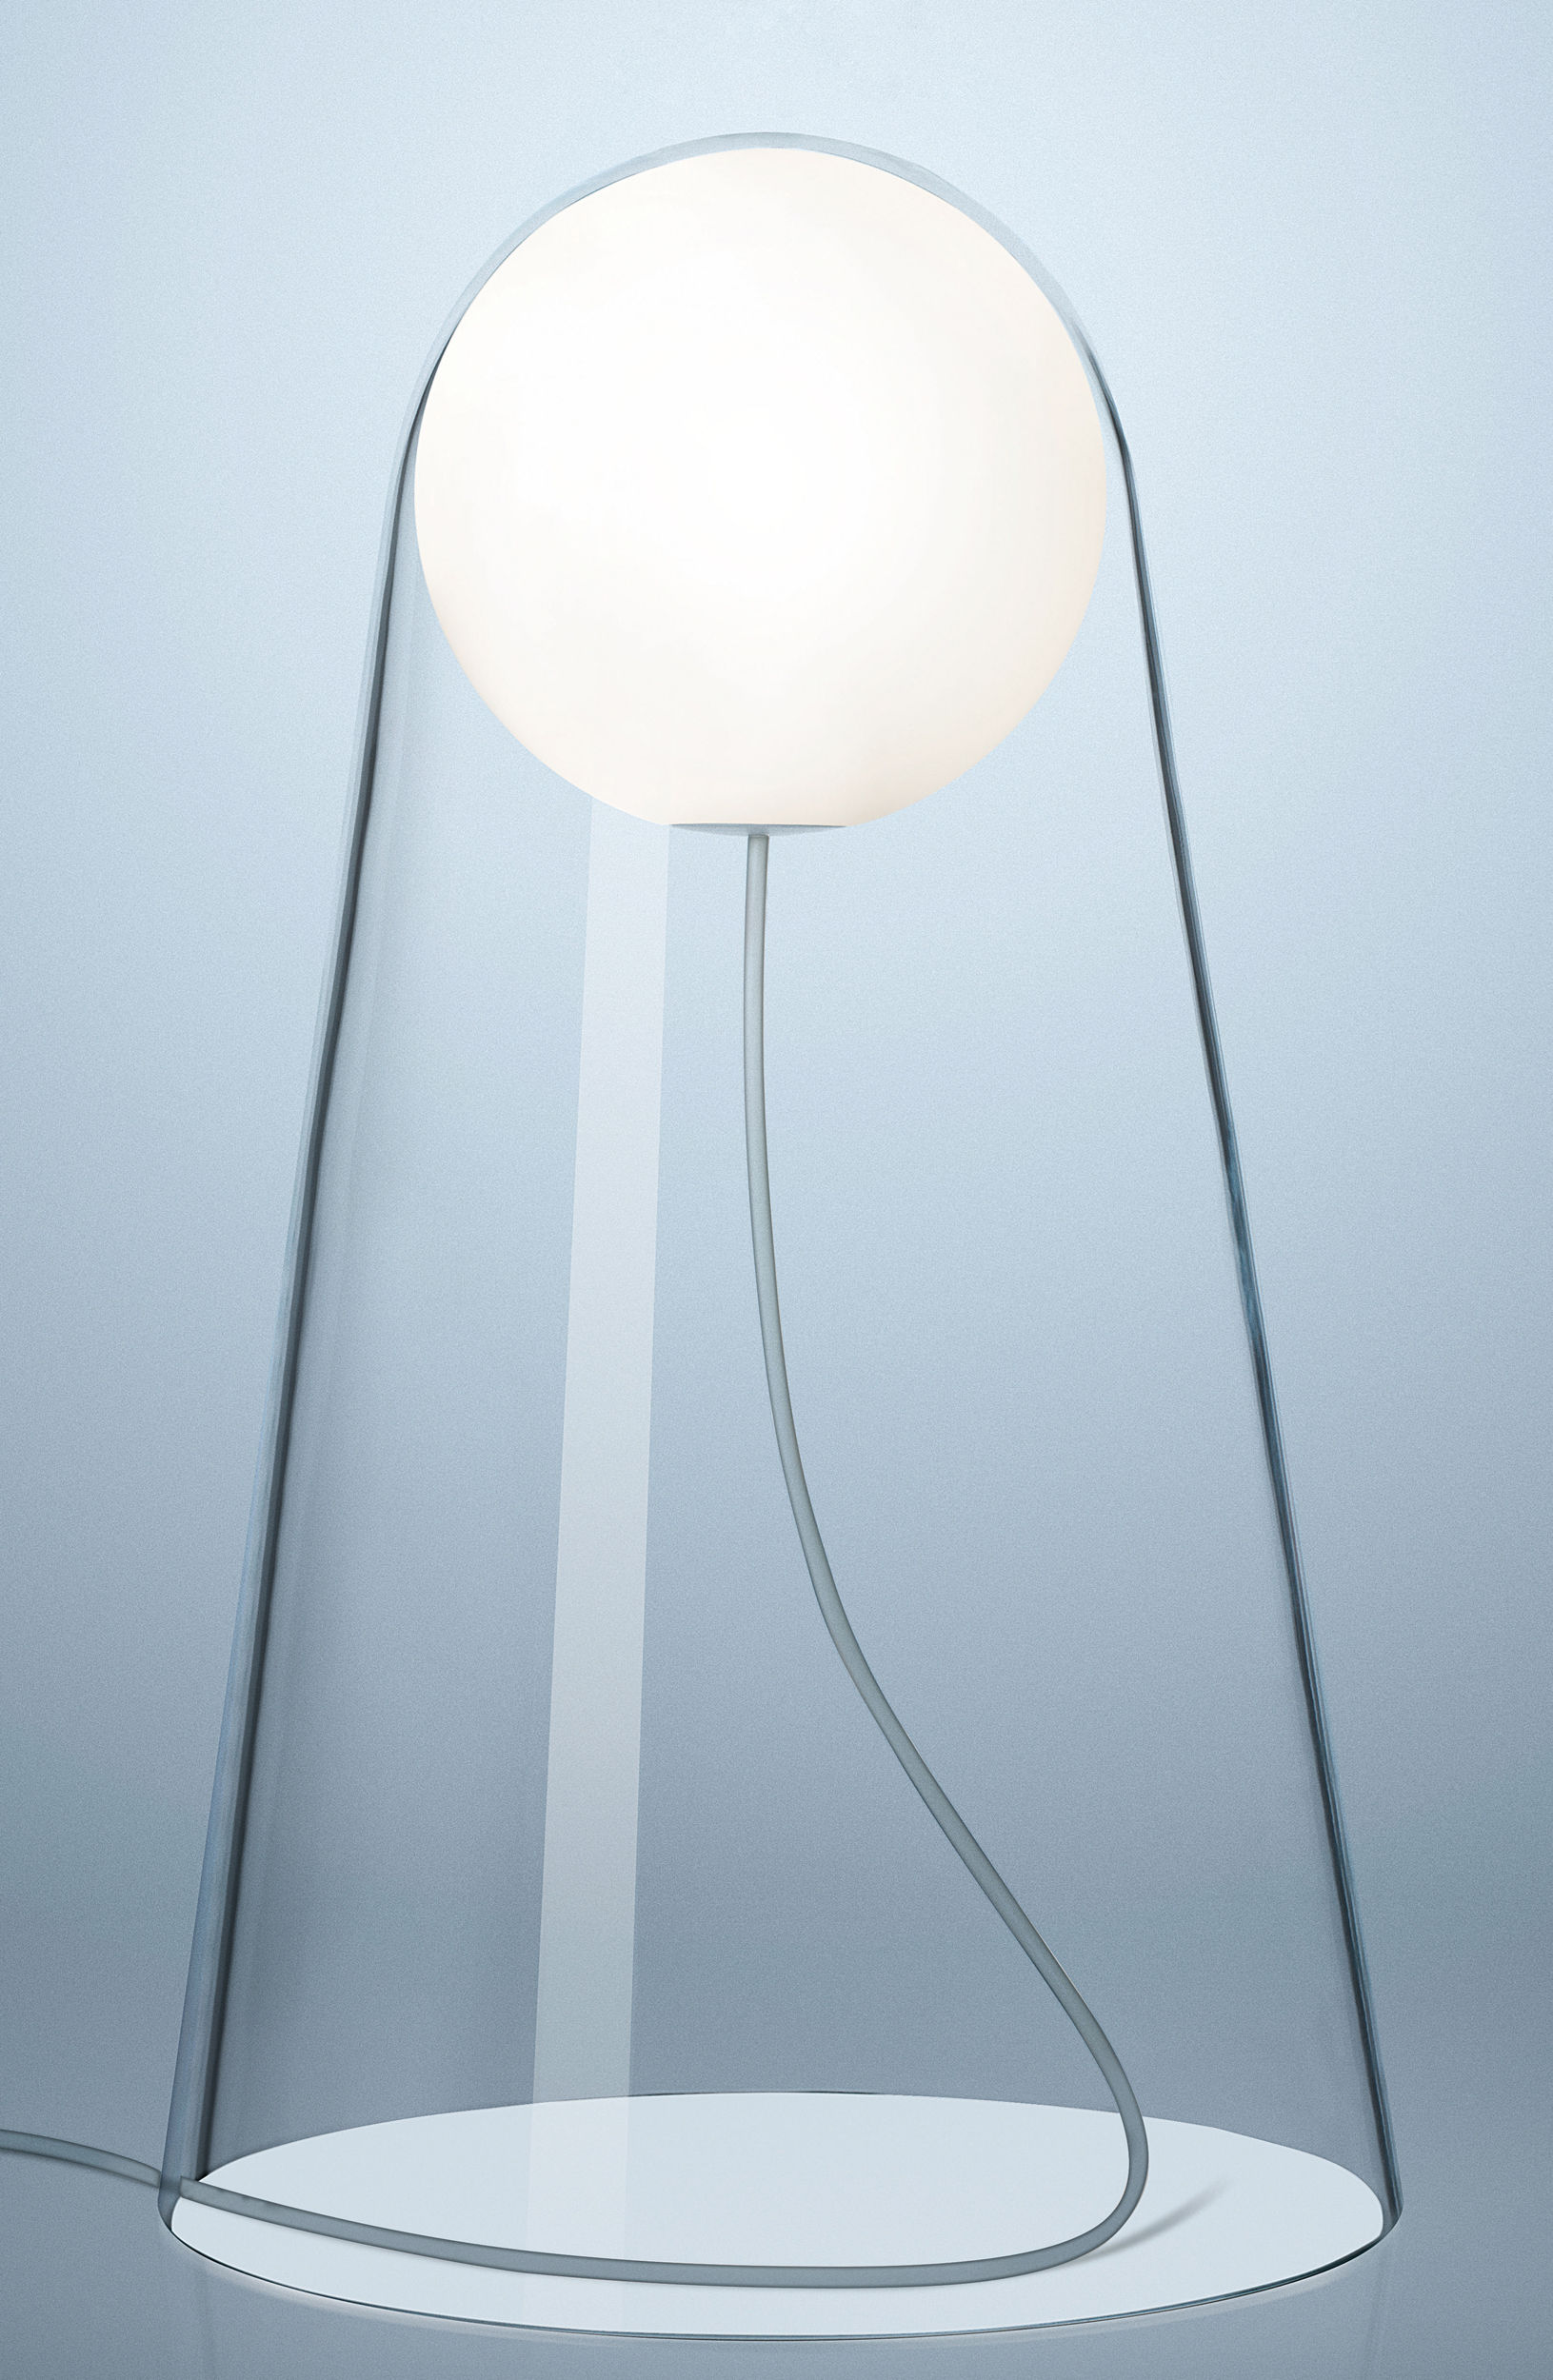 Luminaire - Lampes de table - Lampe de table Satellight LED / Verre soufflé bouche - Foscarini - Transparent / Sphère blanche - Verre soufflé bouche